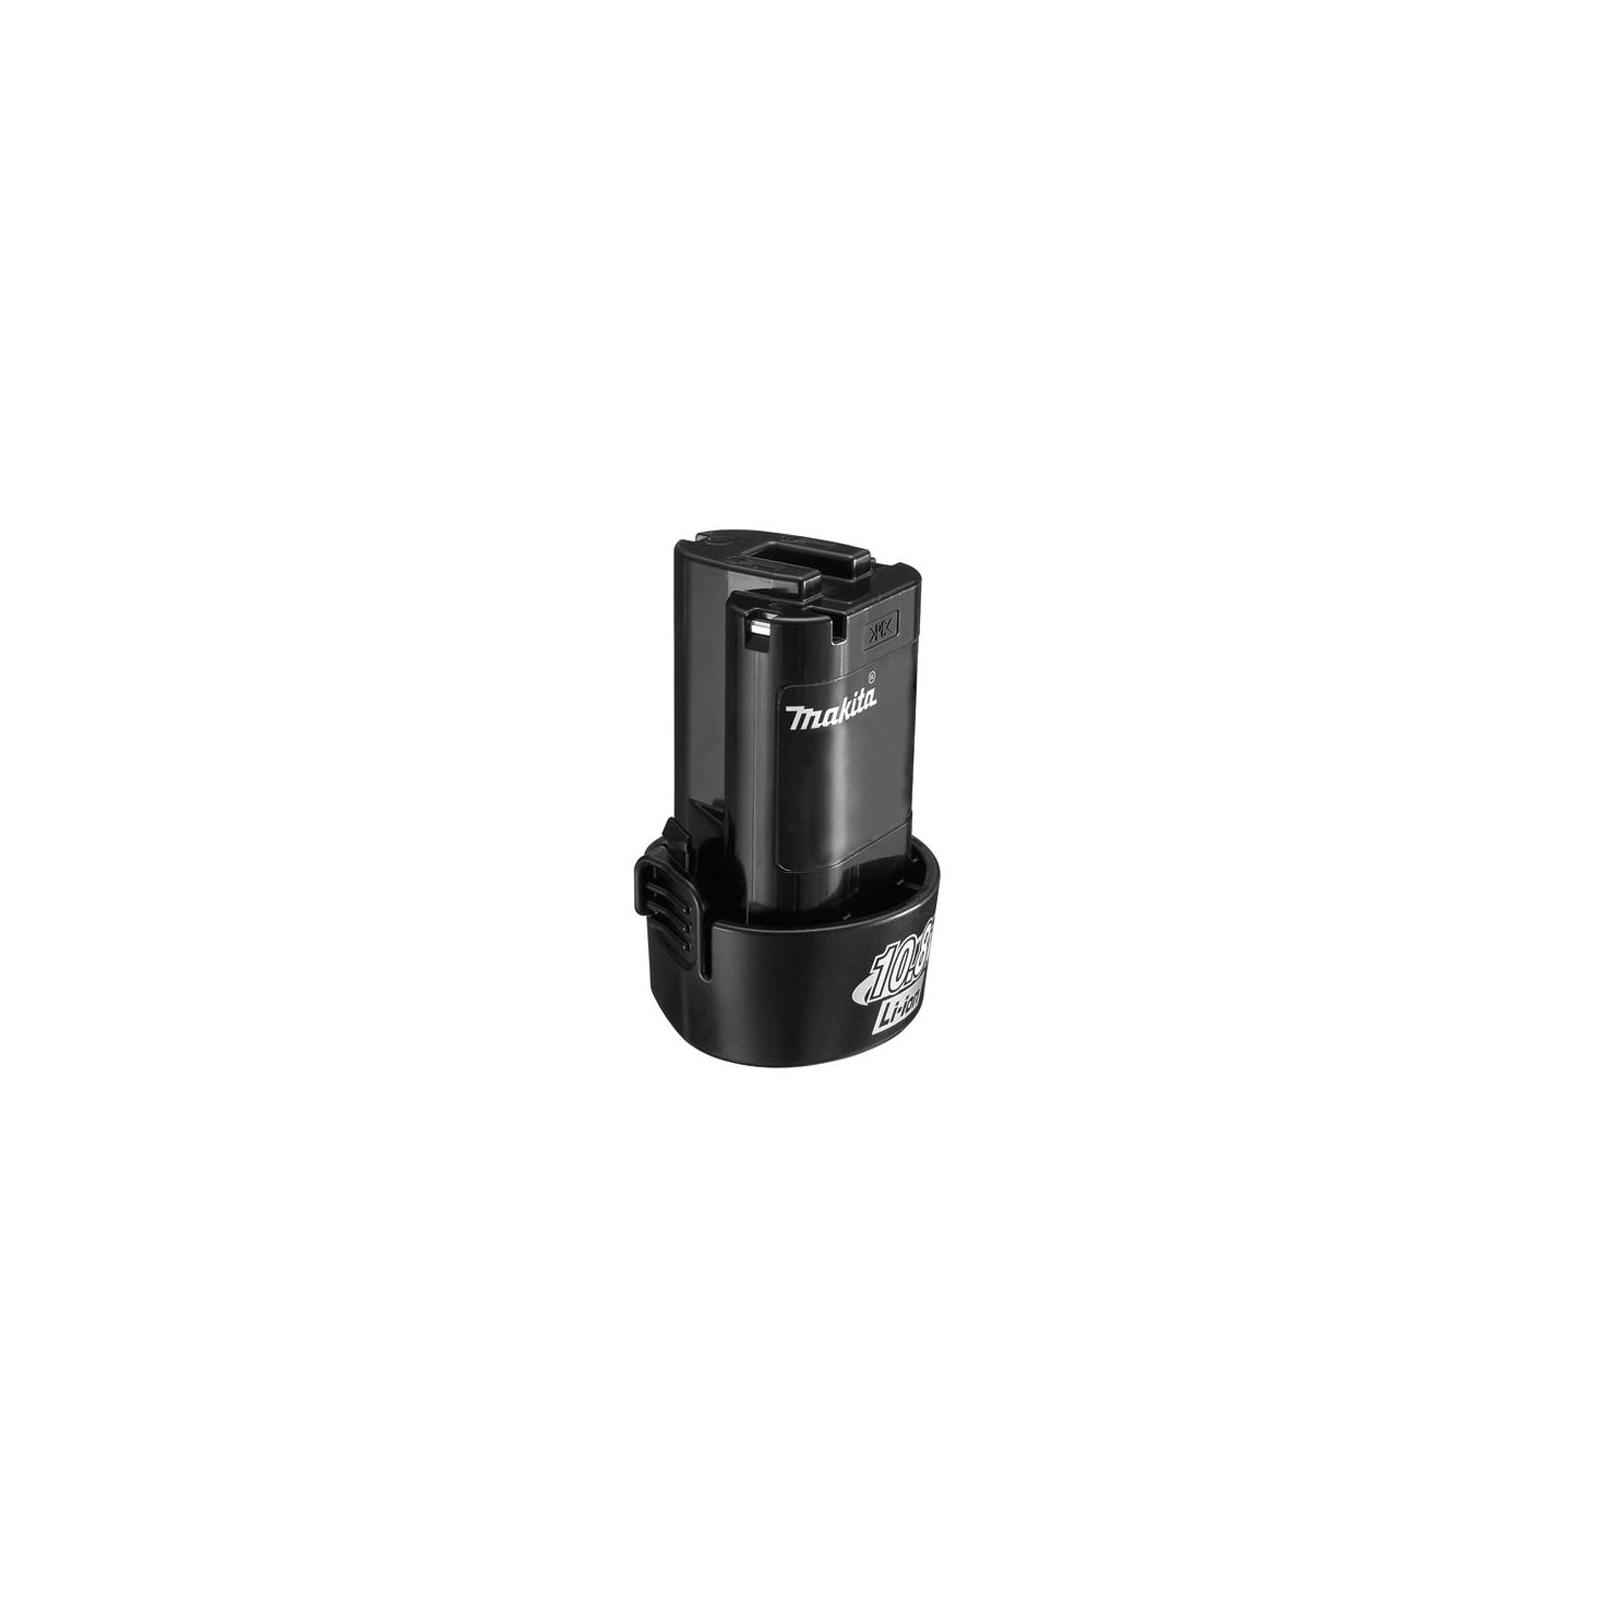 Аккумулятор к электроинструменту Makita Li-Ion BL1013 10,8В,1,3Aч (638593-3) изображение 2